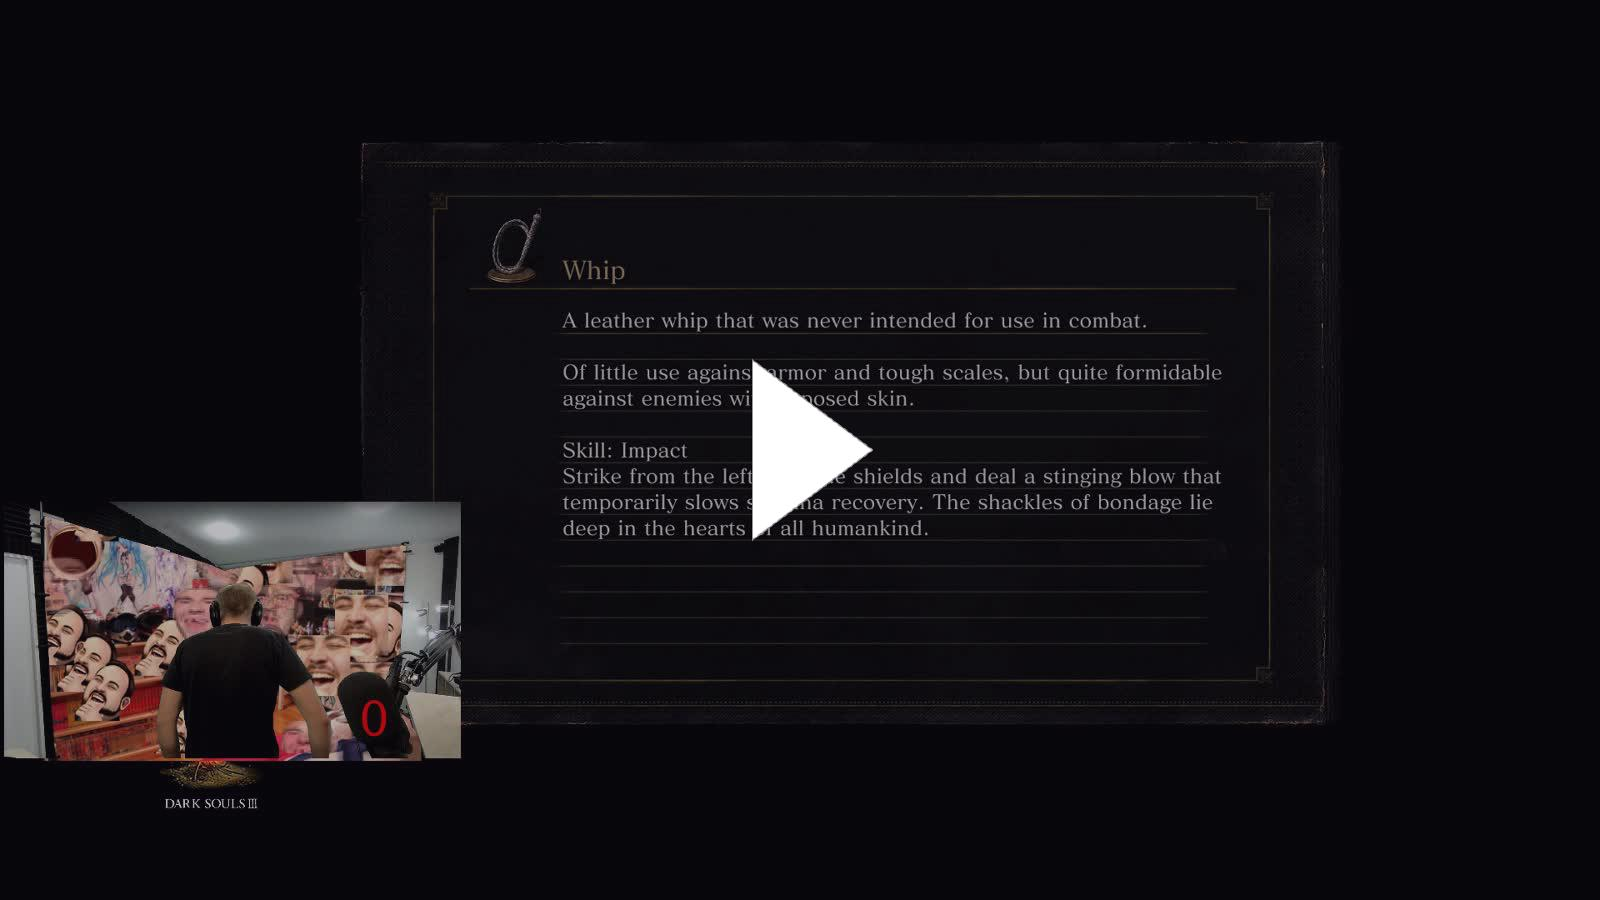 Quin69 - Autism strikes - Twitch